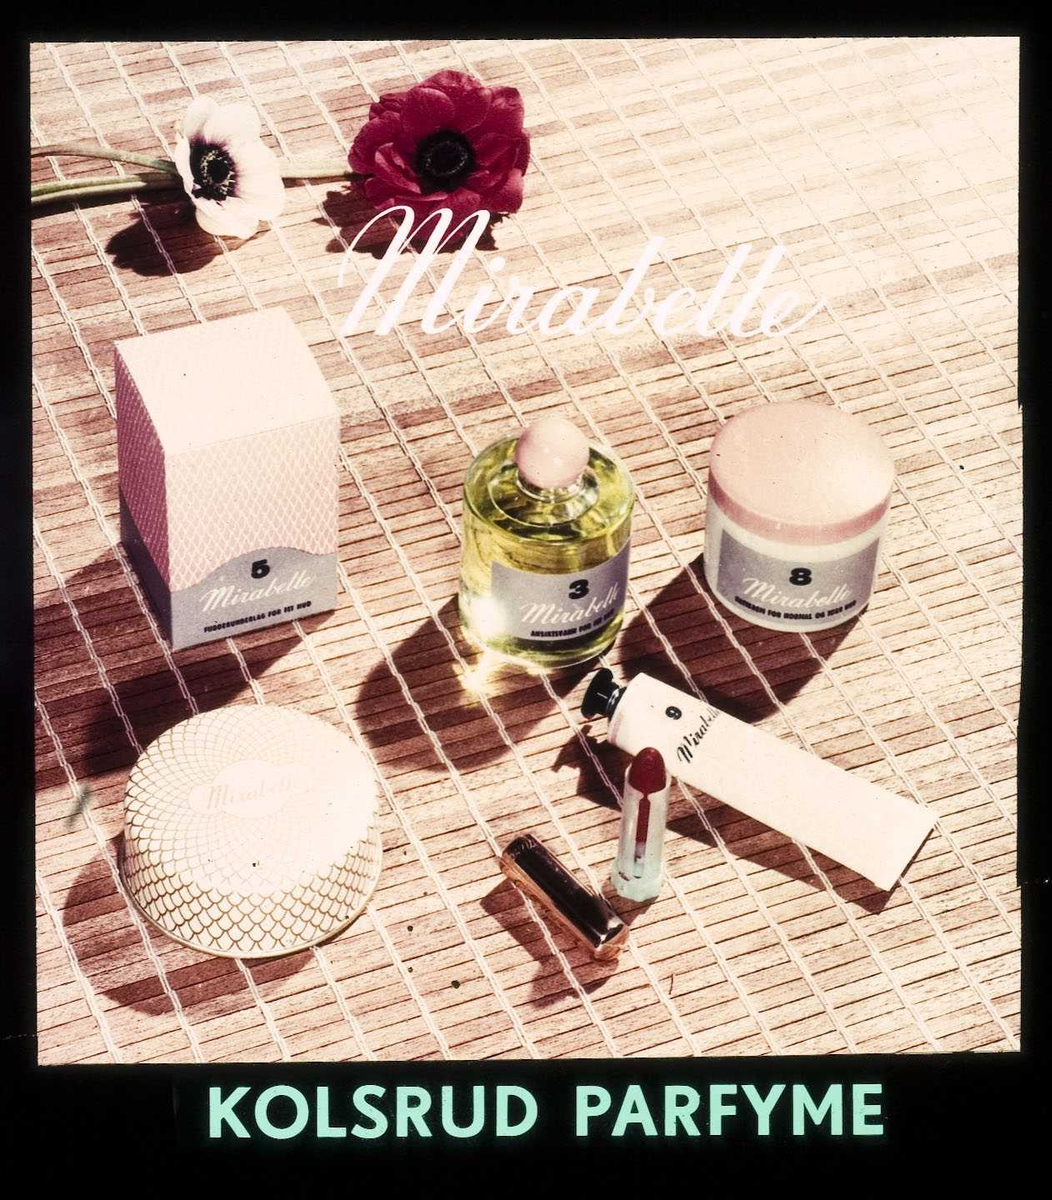 Kinoreklame fra Ski for Mirabelle kosmetikk. Kolsrud parfyme